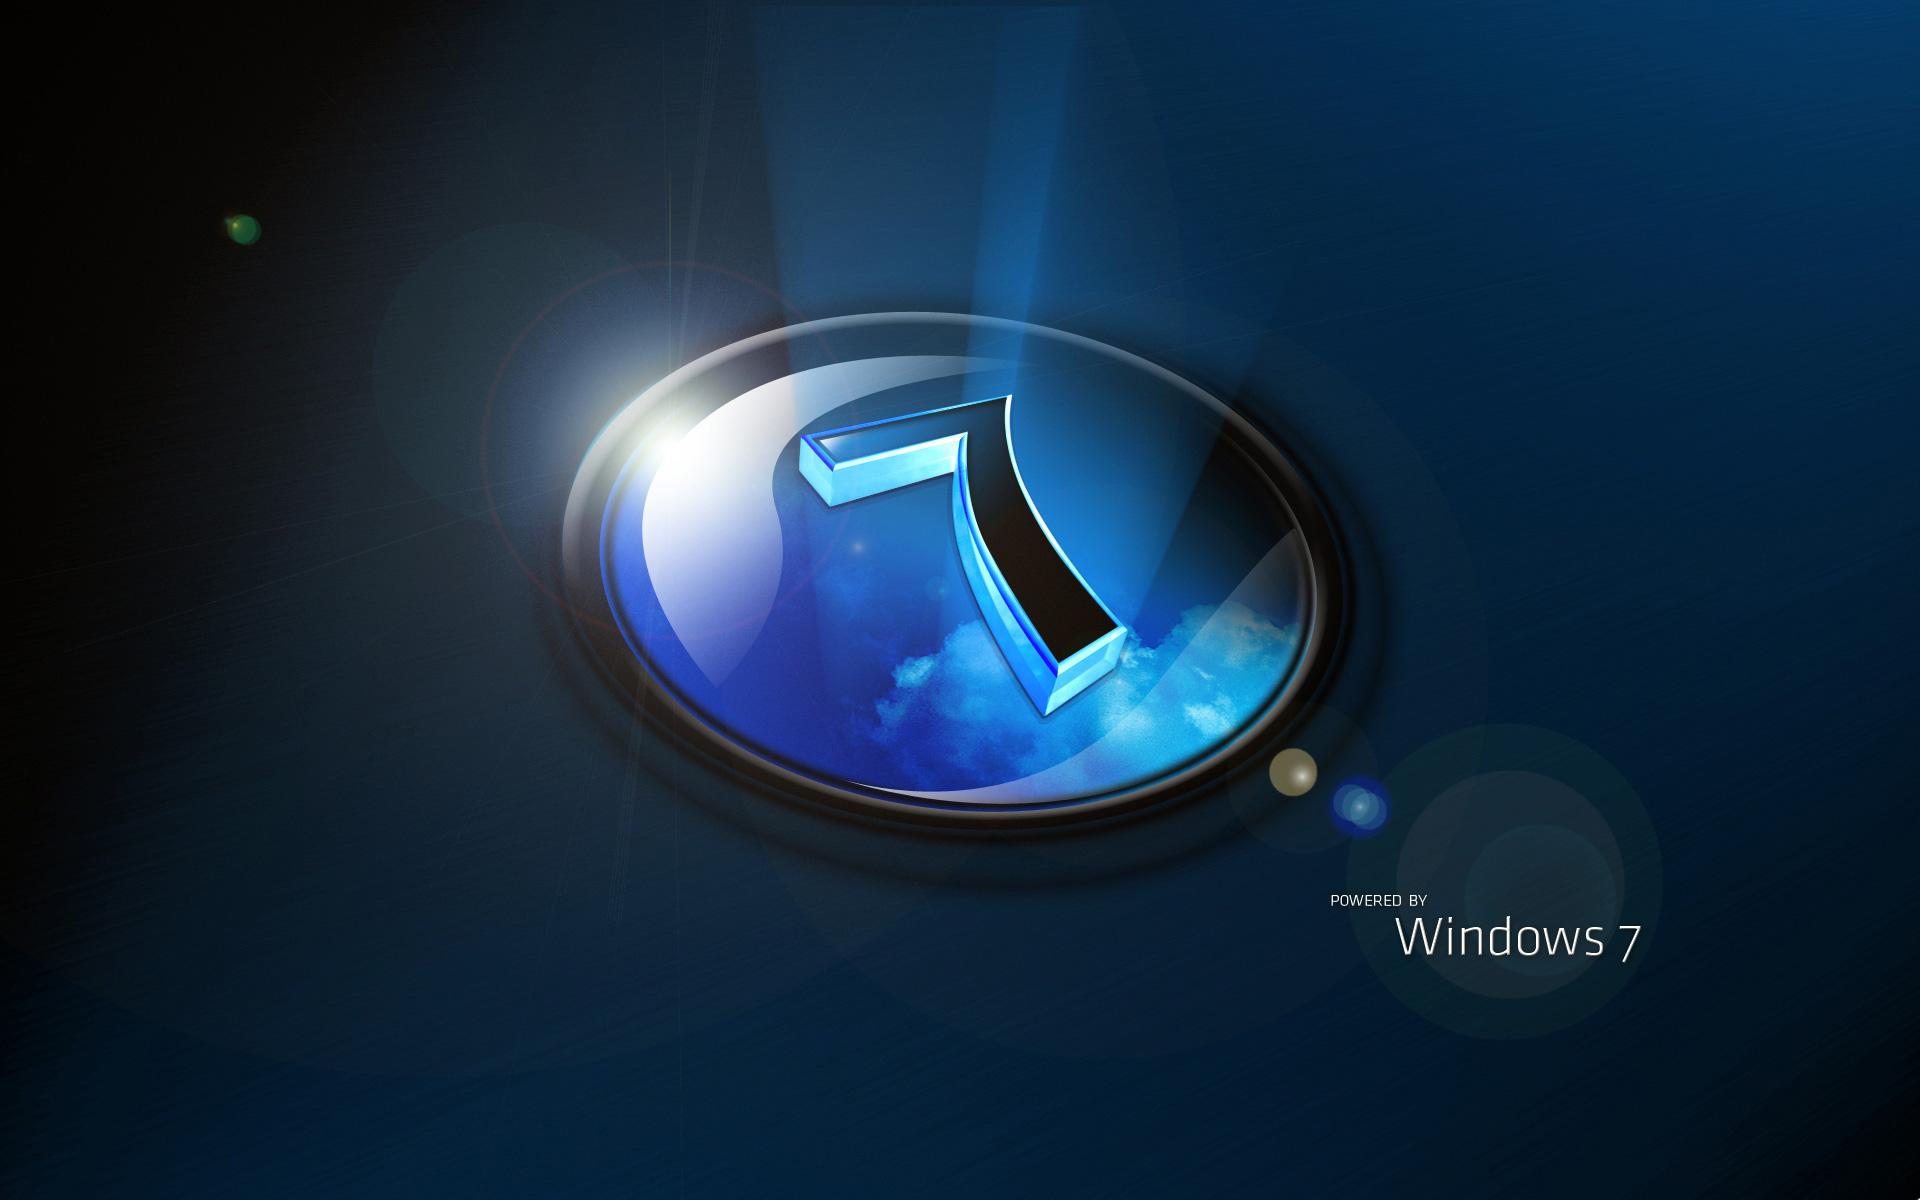 Wallpaper windows 7 64 bit wallpapersafari for Window 64 bit